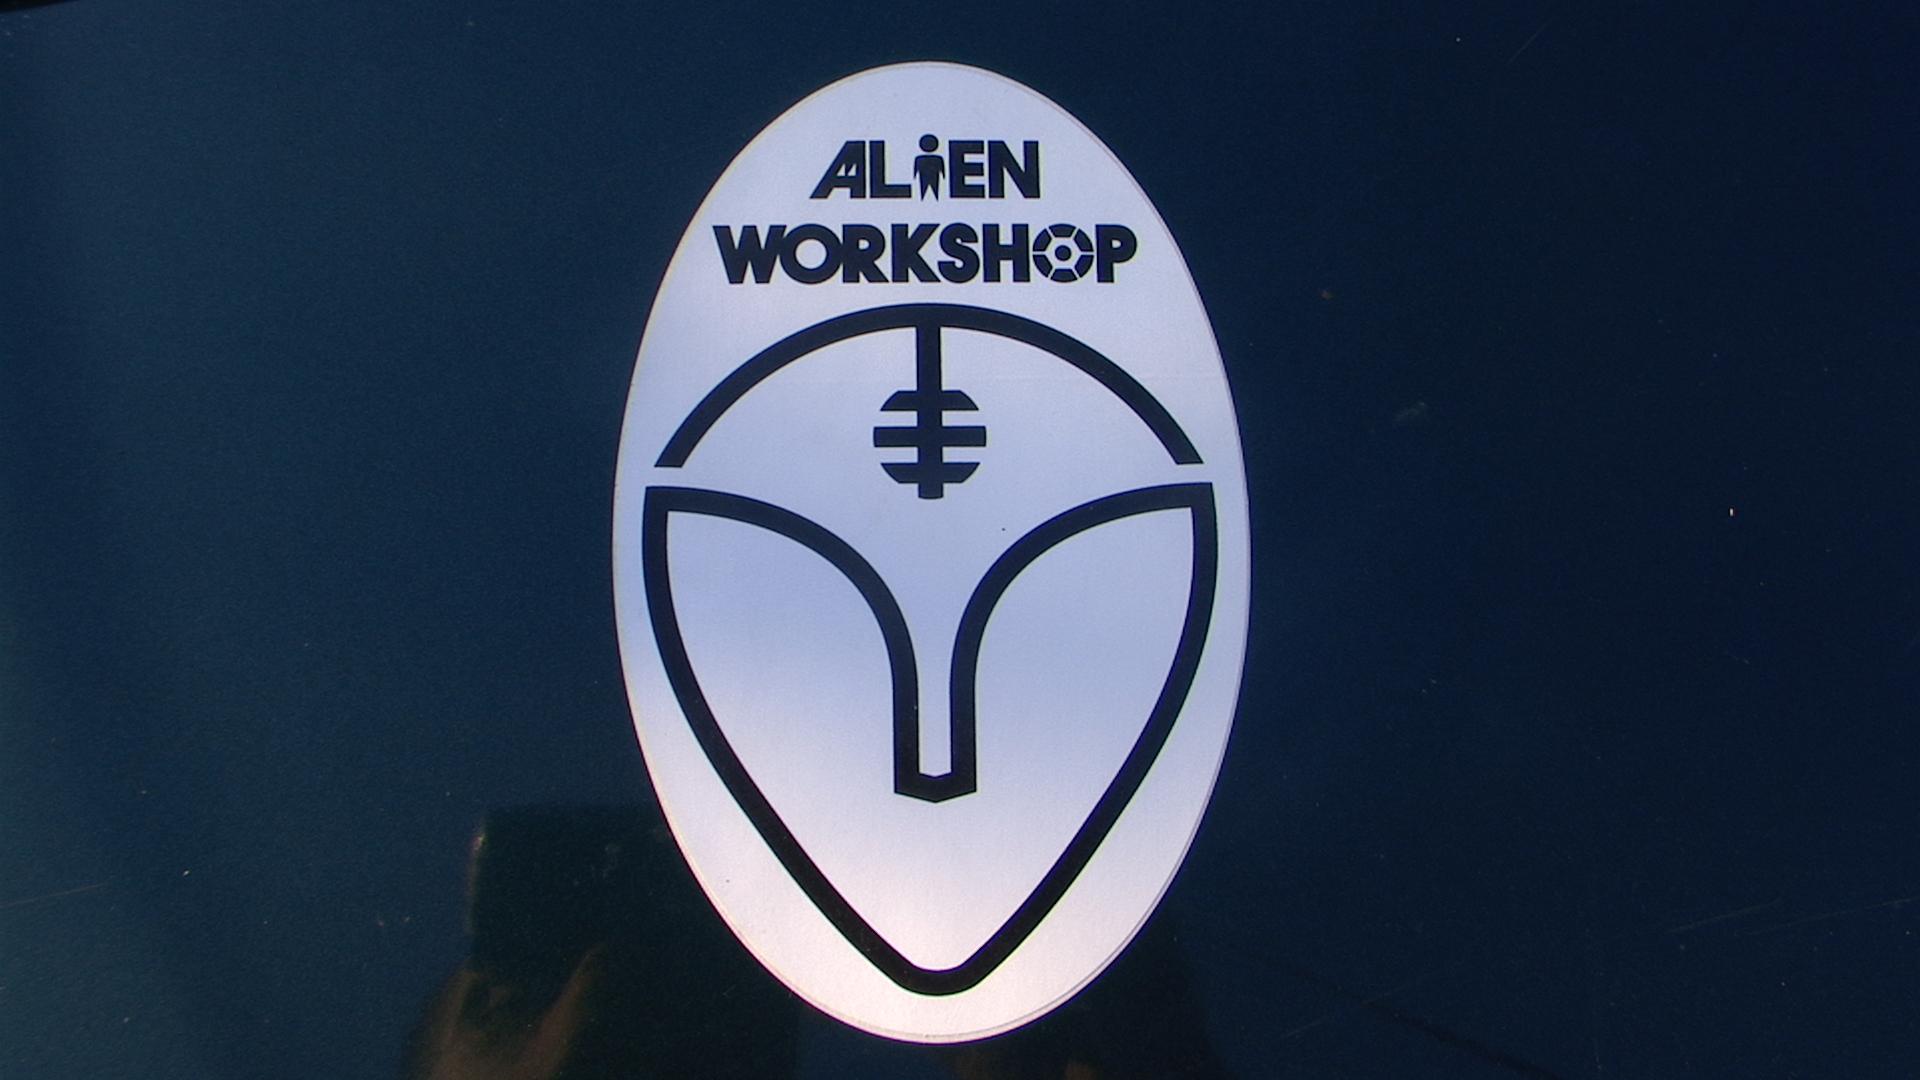 alien workshop wallpaper - photo #29